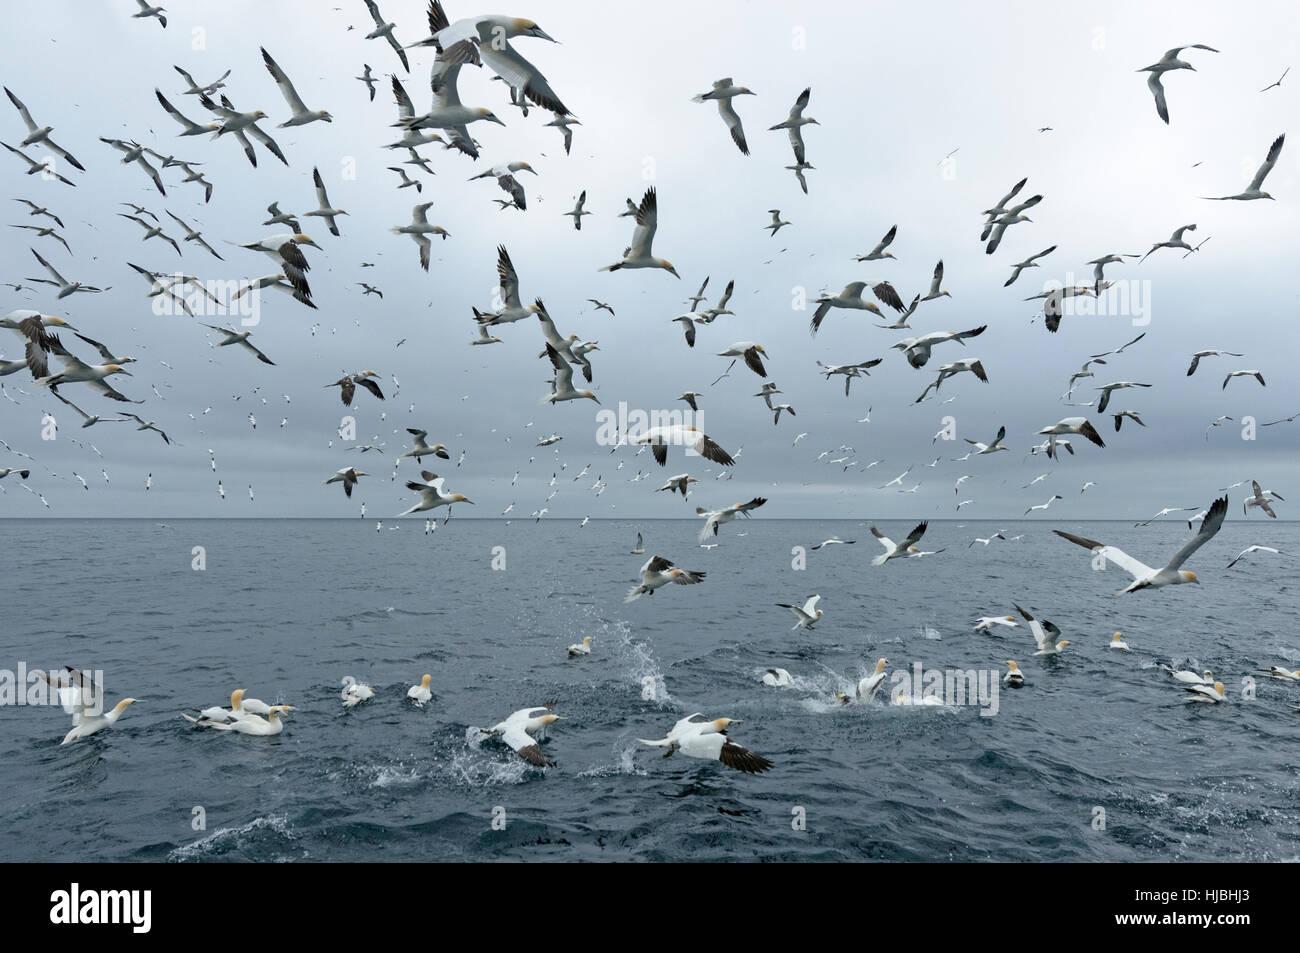 Feeding flock of northern gannets (Morus bassanus) in the Shetland Isles. June. - Stock Image